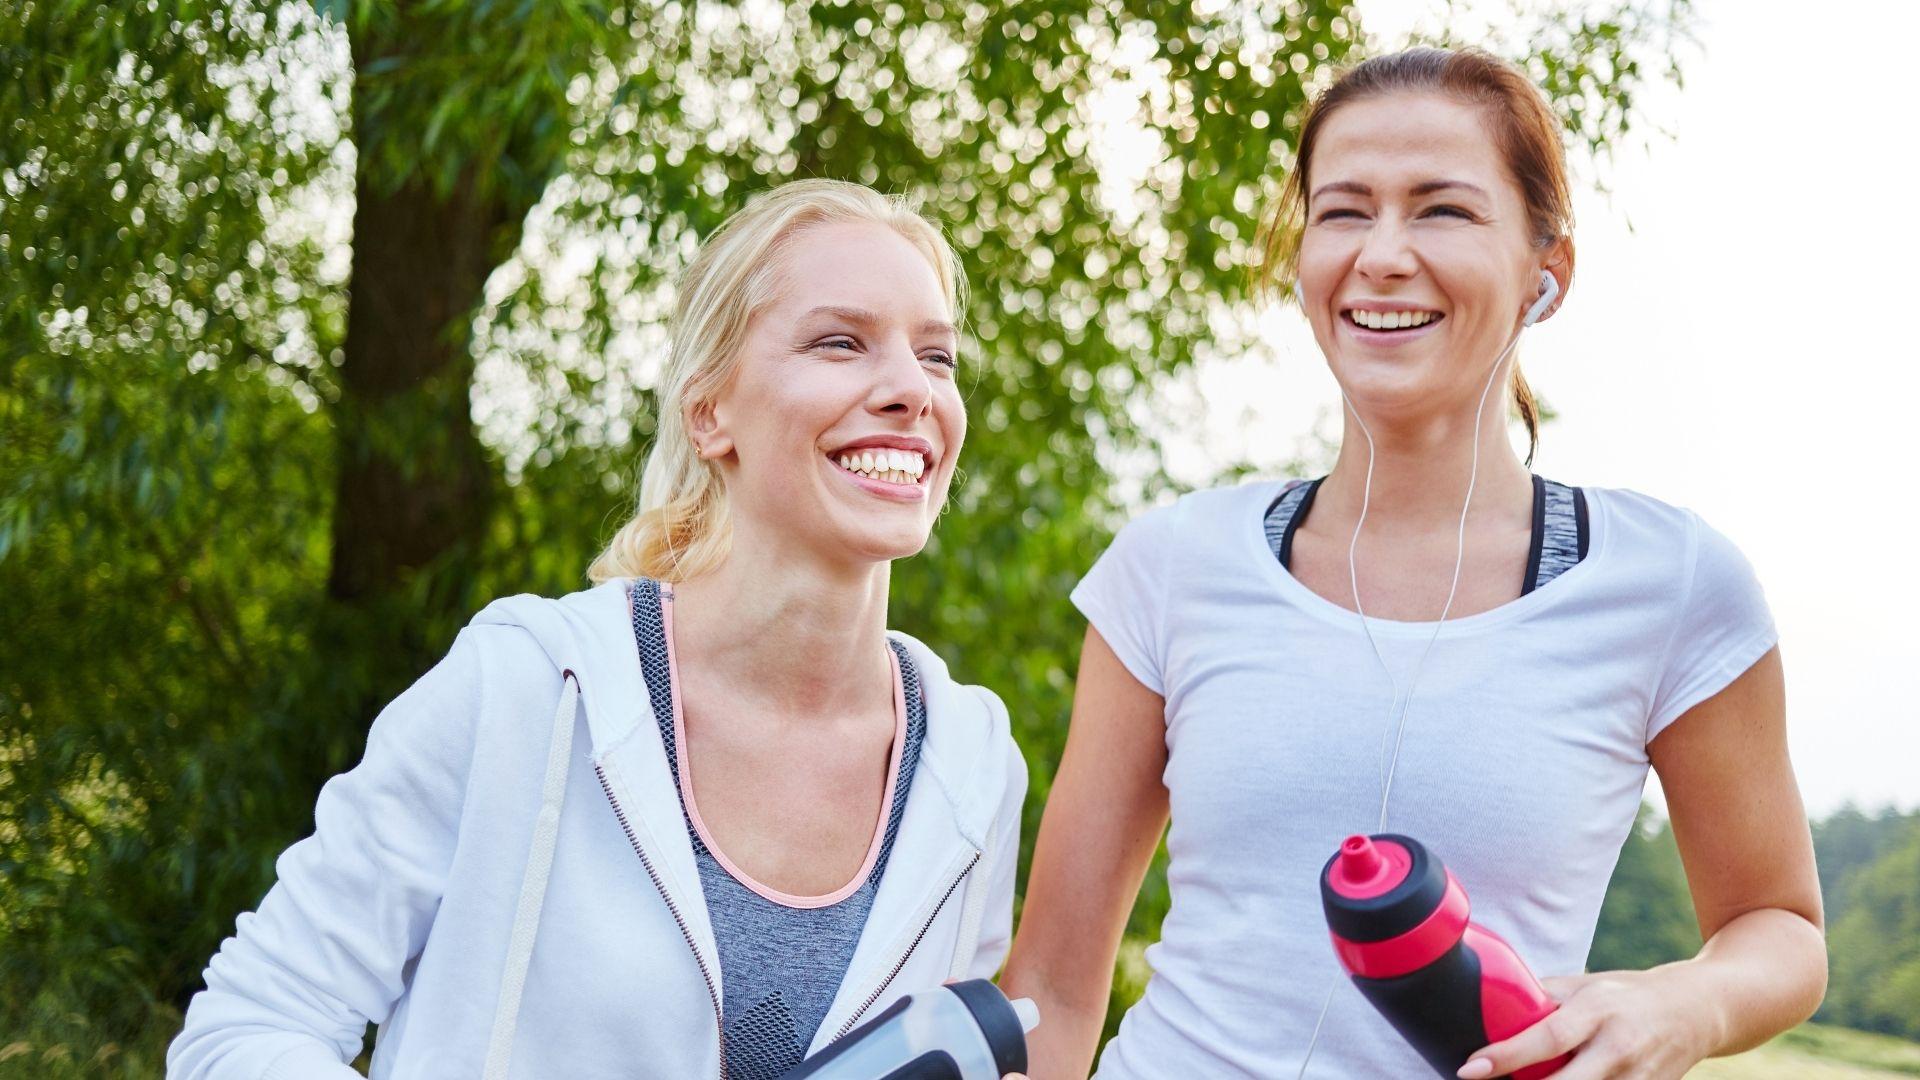 Edinburgh Women's Fitness with Elspeth Alexandra